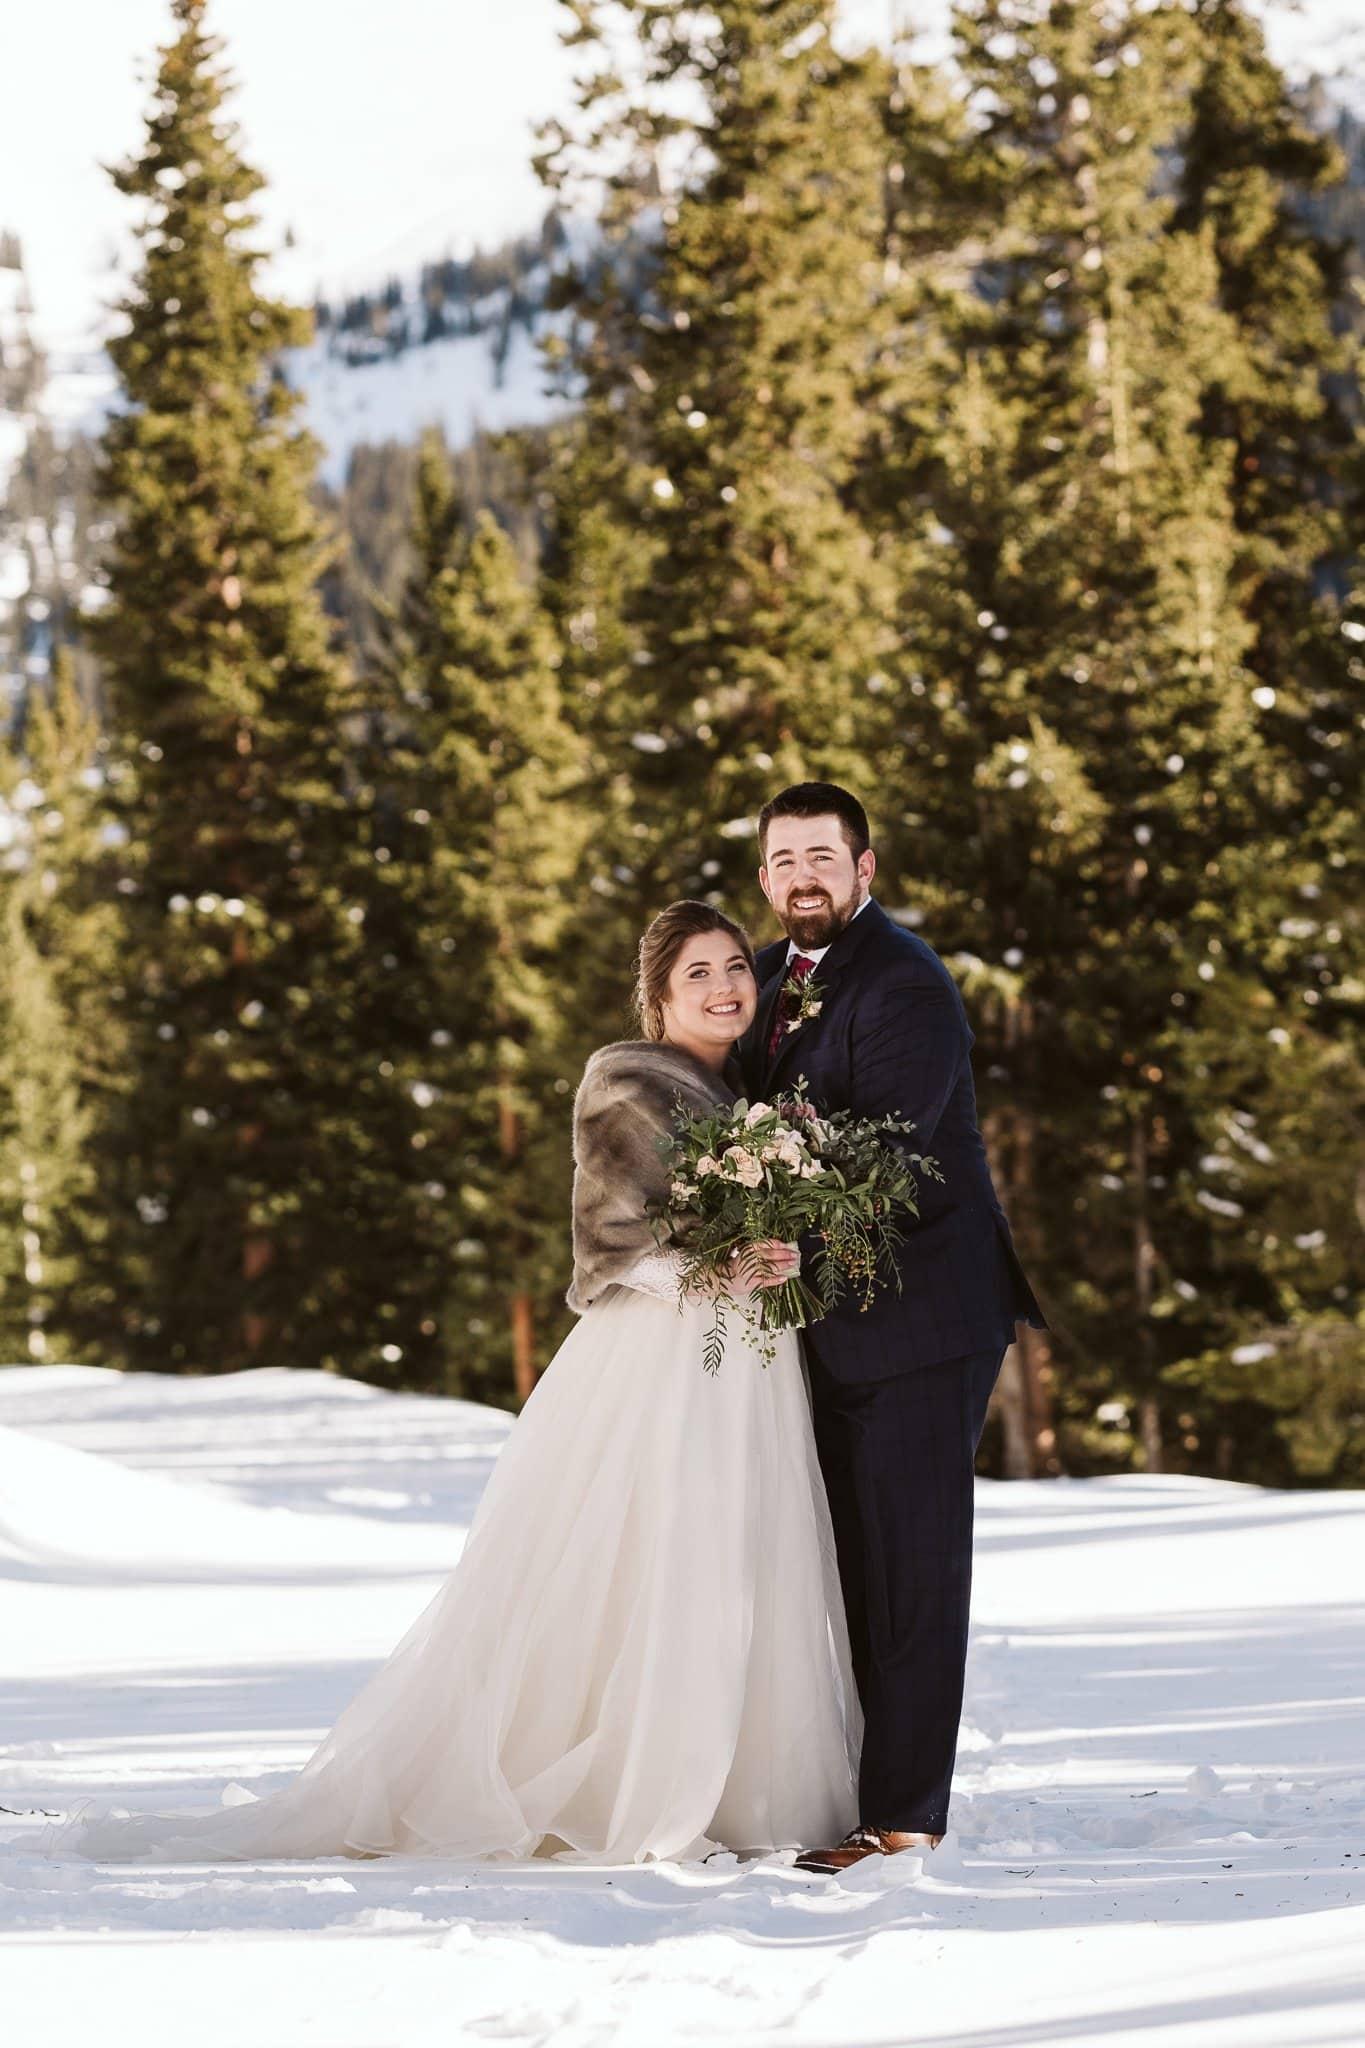 Winter elopement at Keystone Ski Resort.